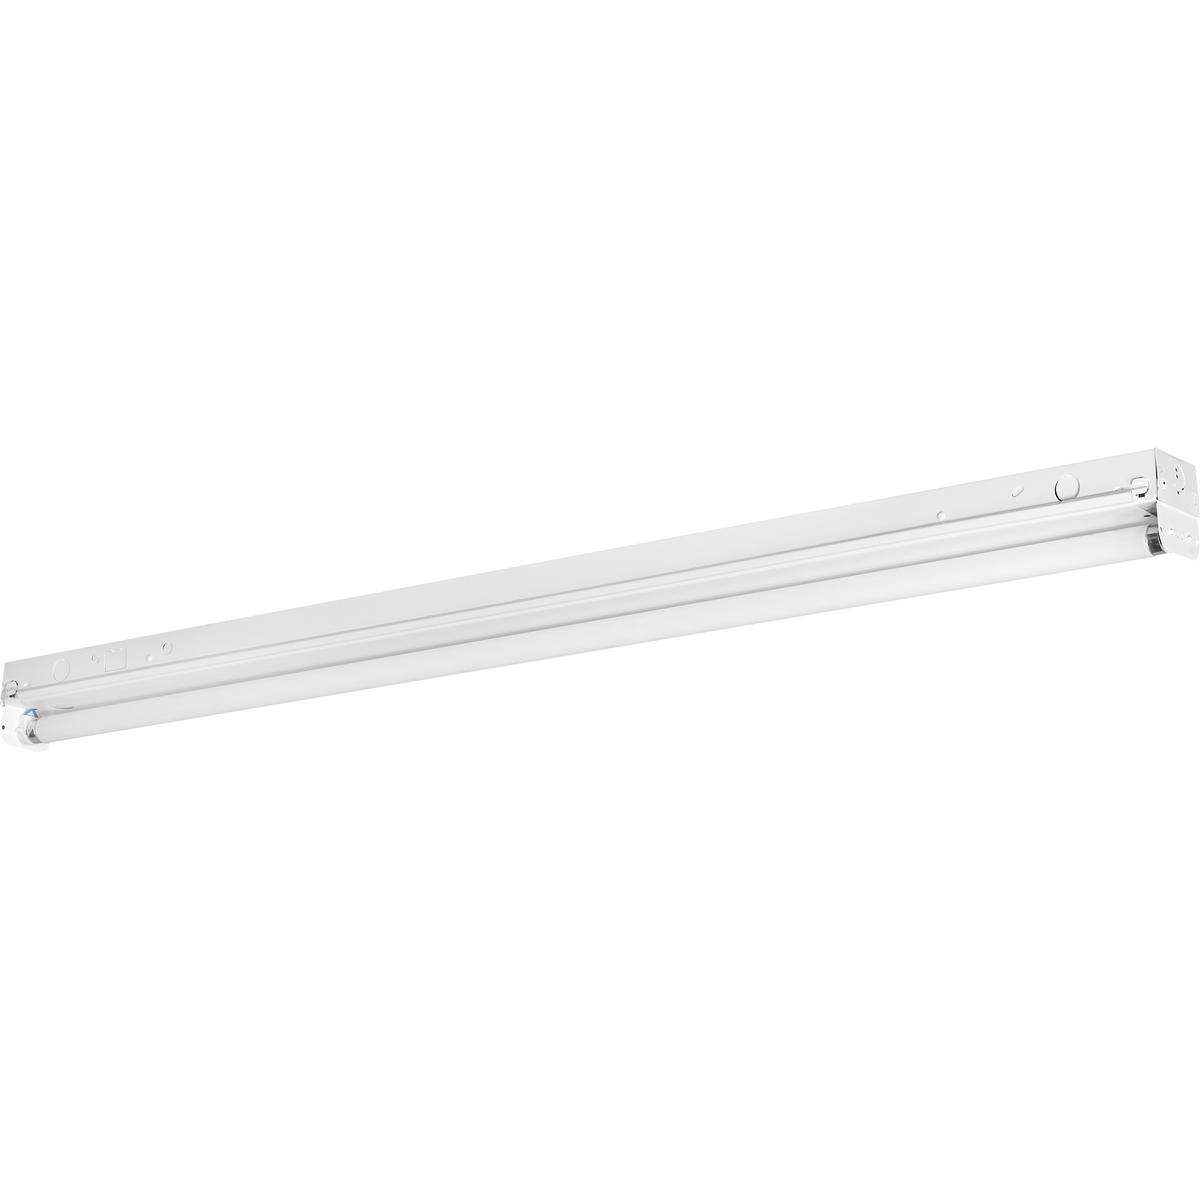 PRO P7267-30EB One Light White Fluorescent Light 1X32Bi-Pin Twist-In NRM 2012